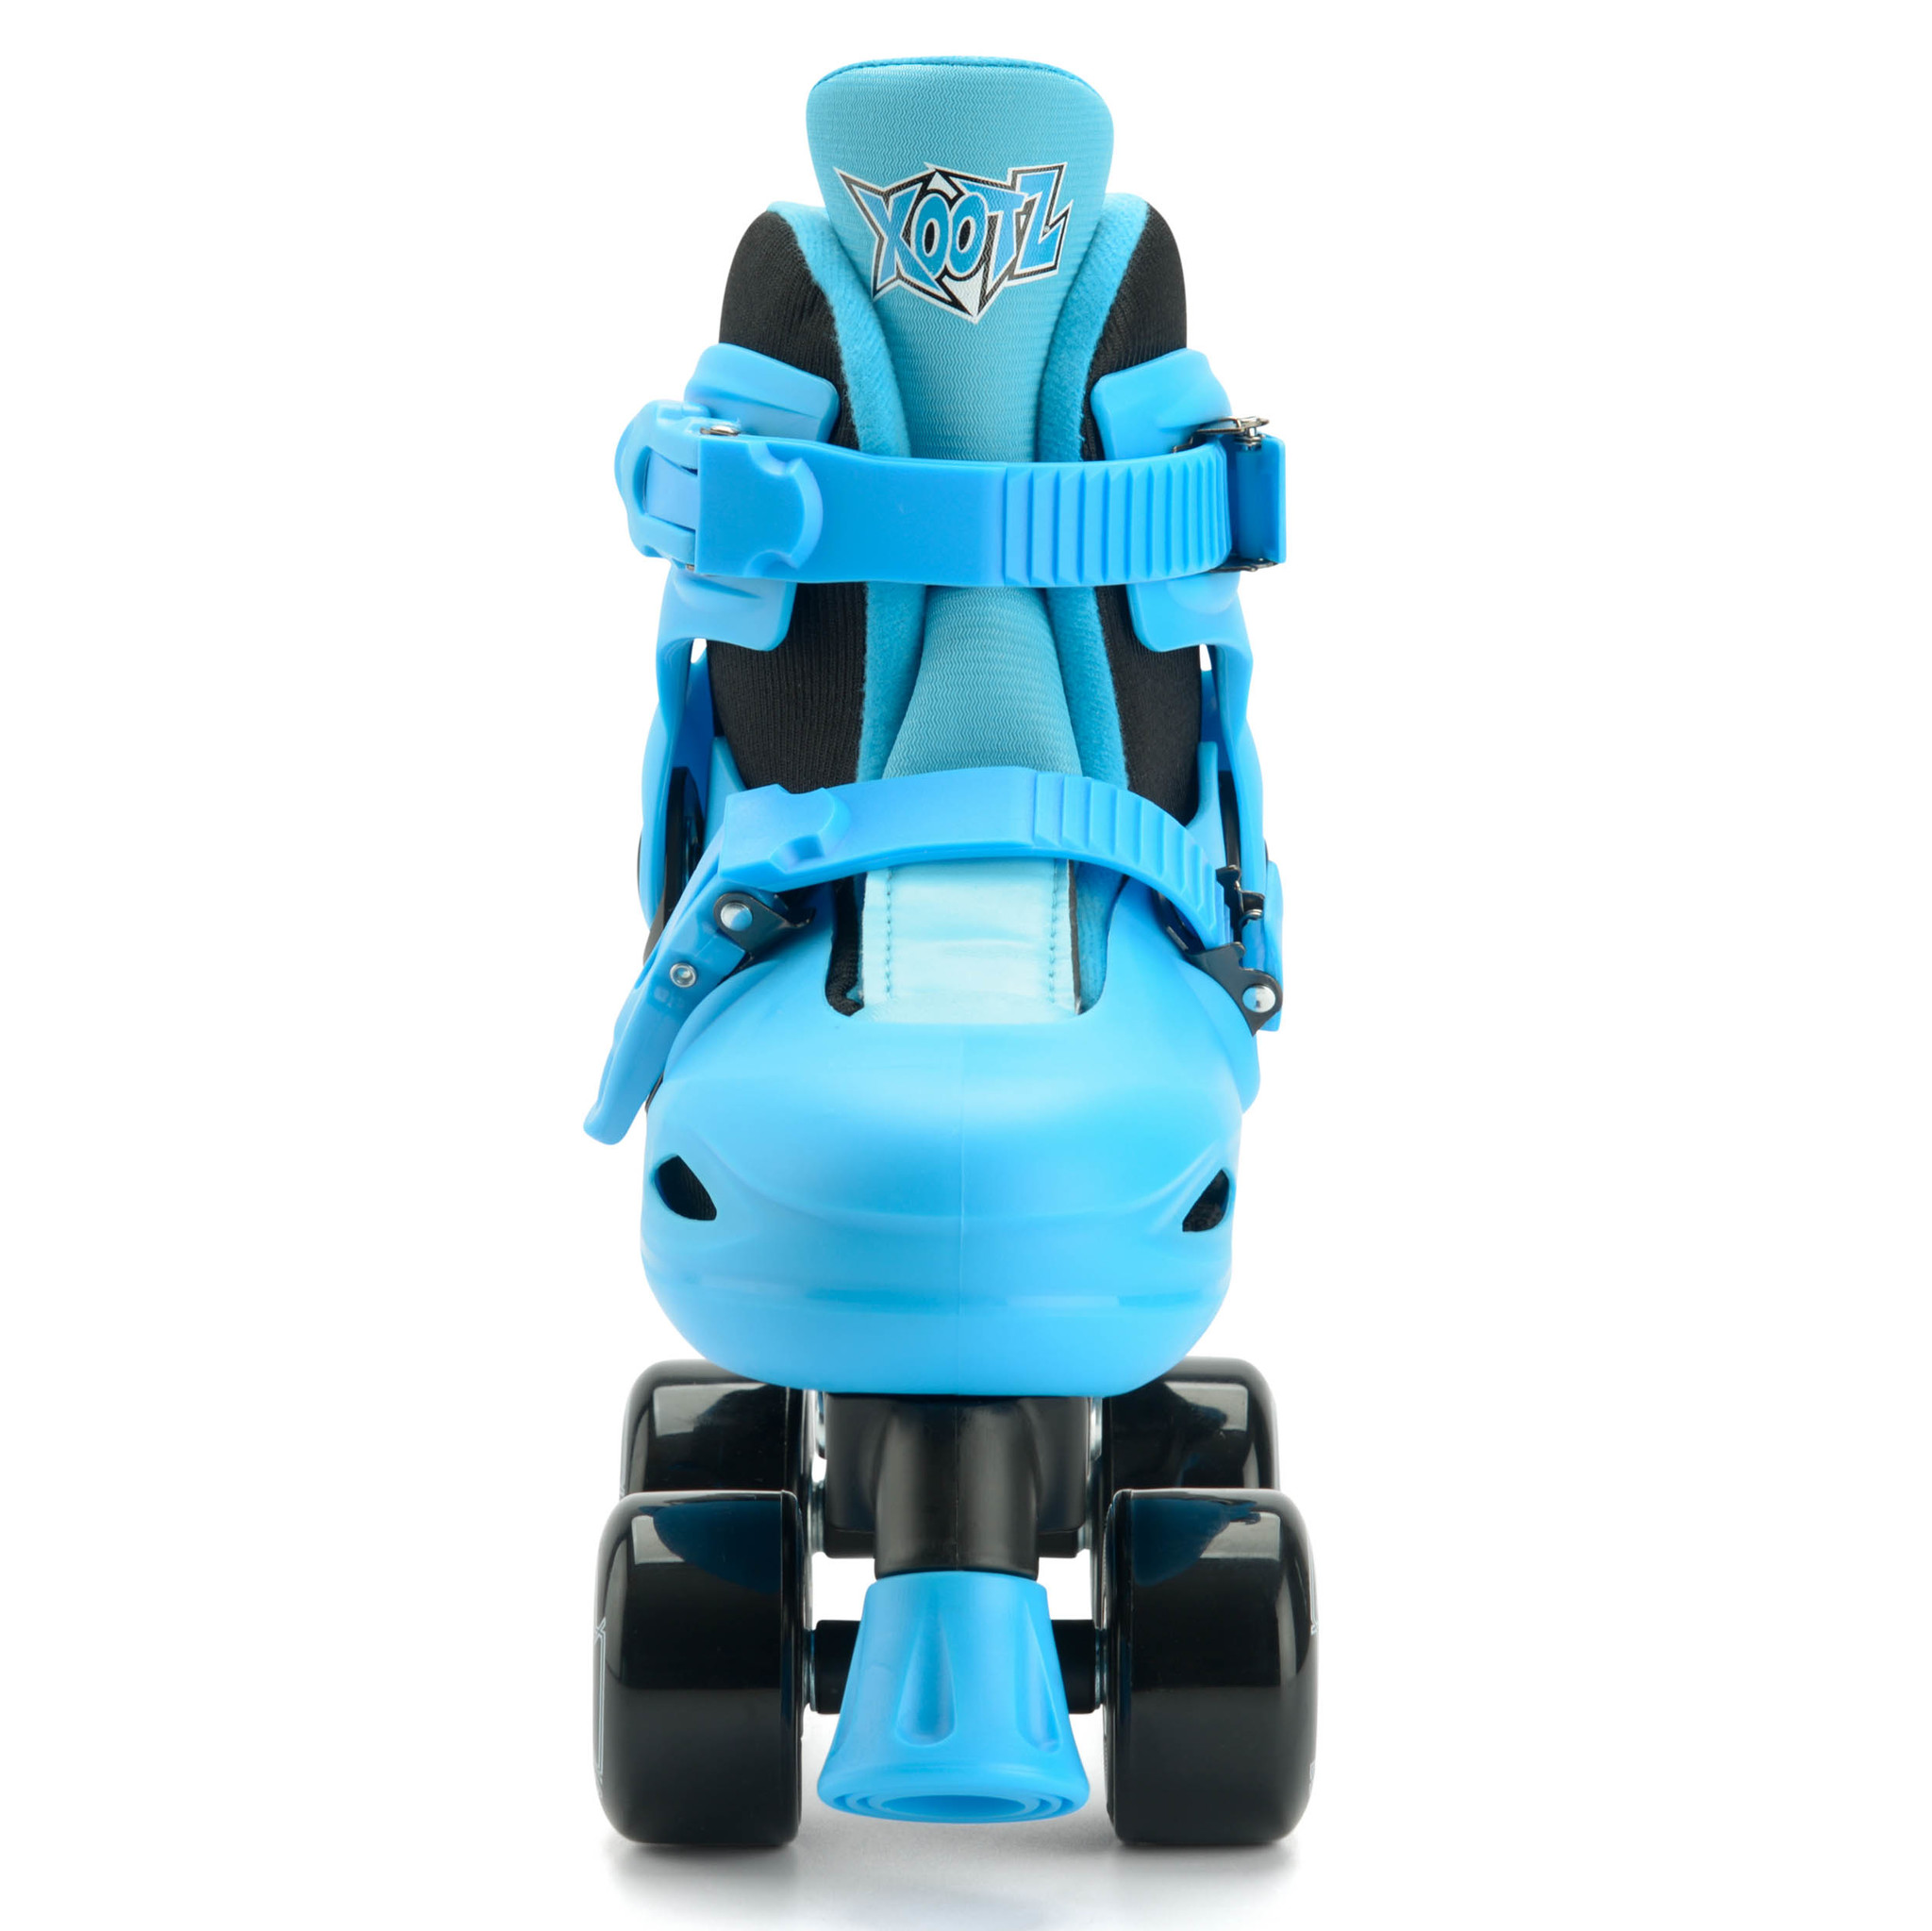 xootz quad skates blue